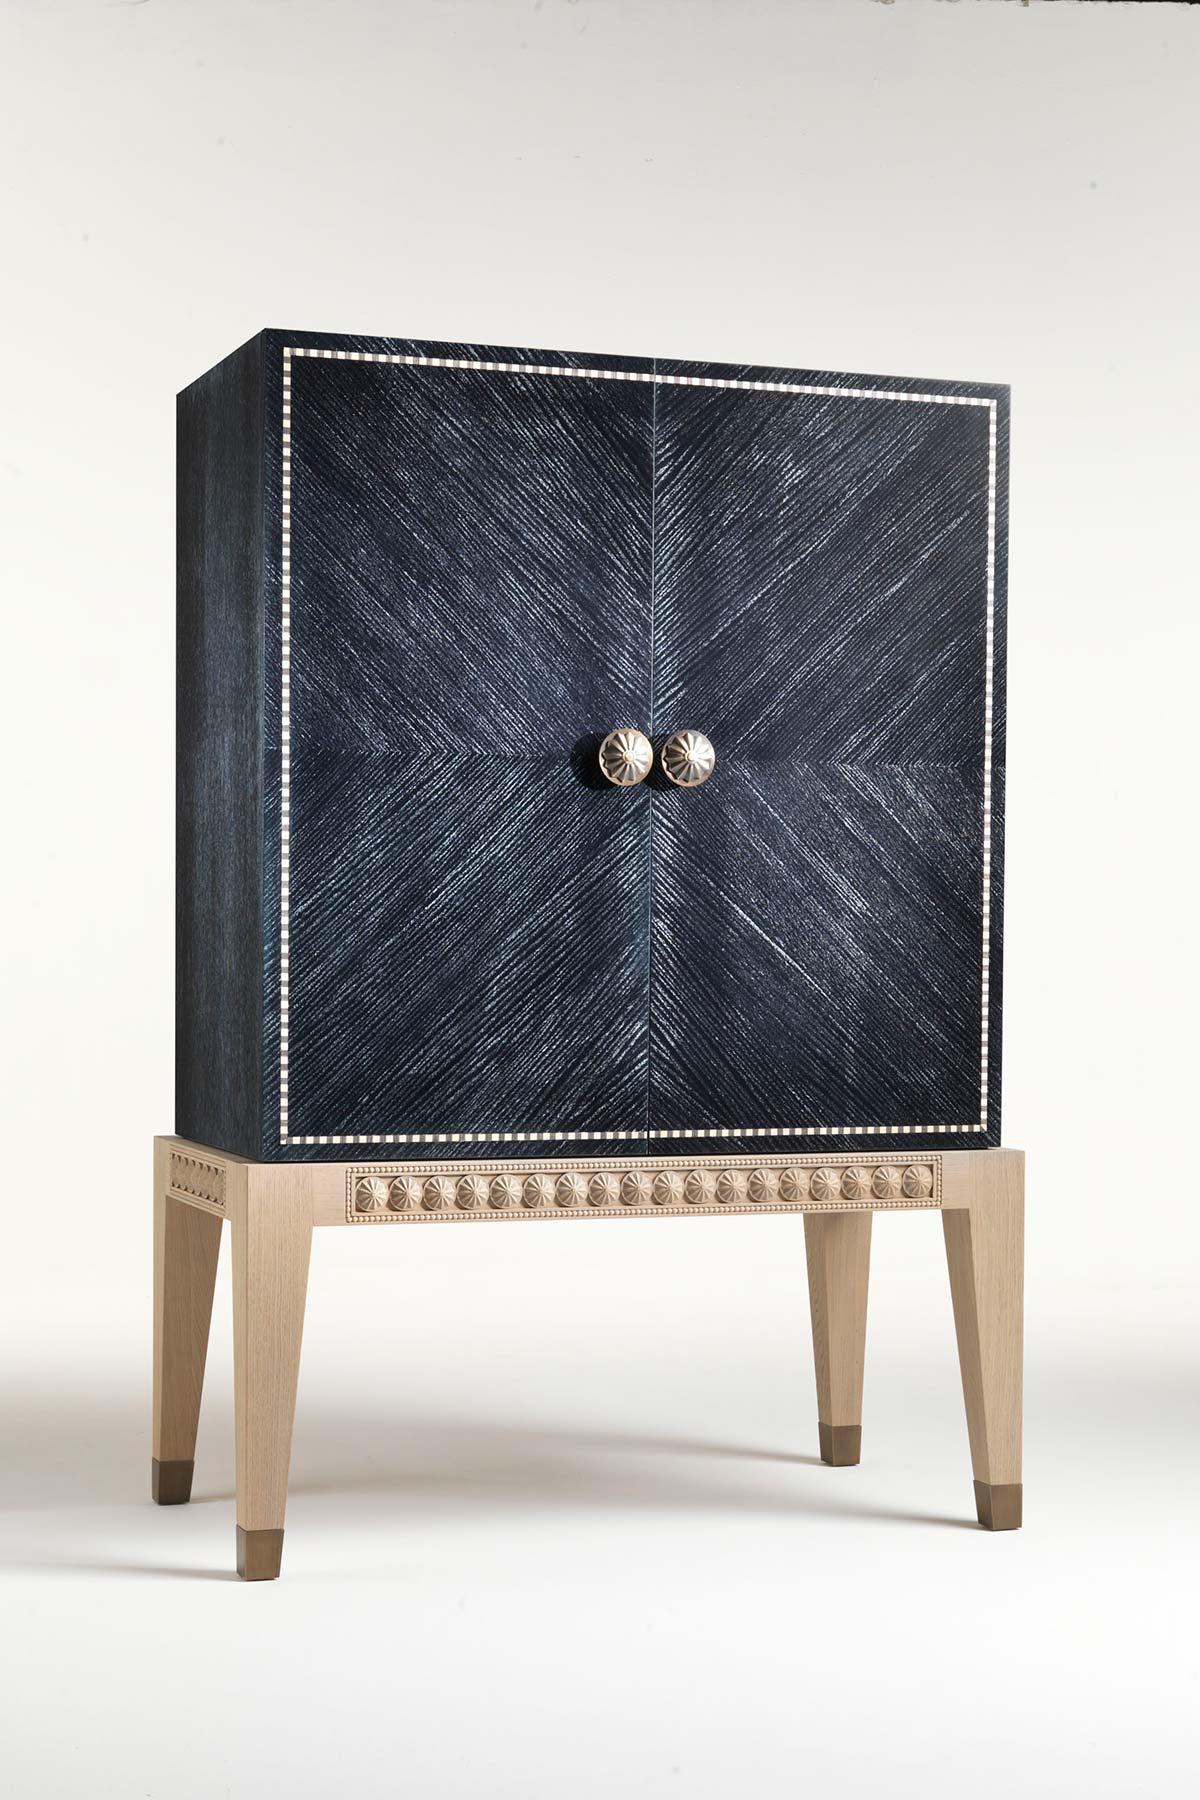 Kimbolton by Fratelli Boffi, Design Archer Humphryes Architects